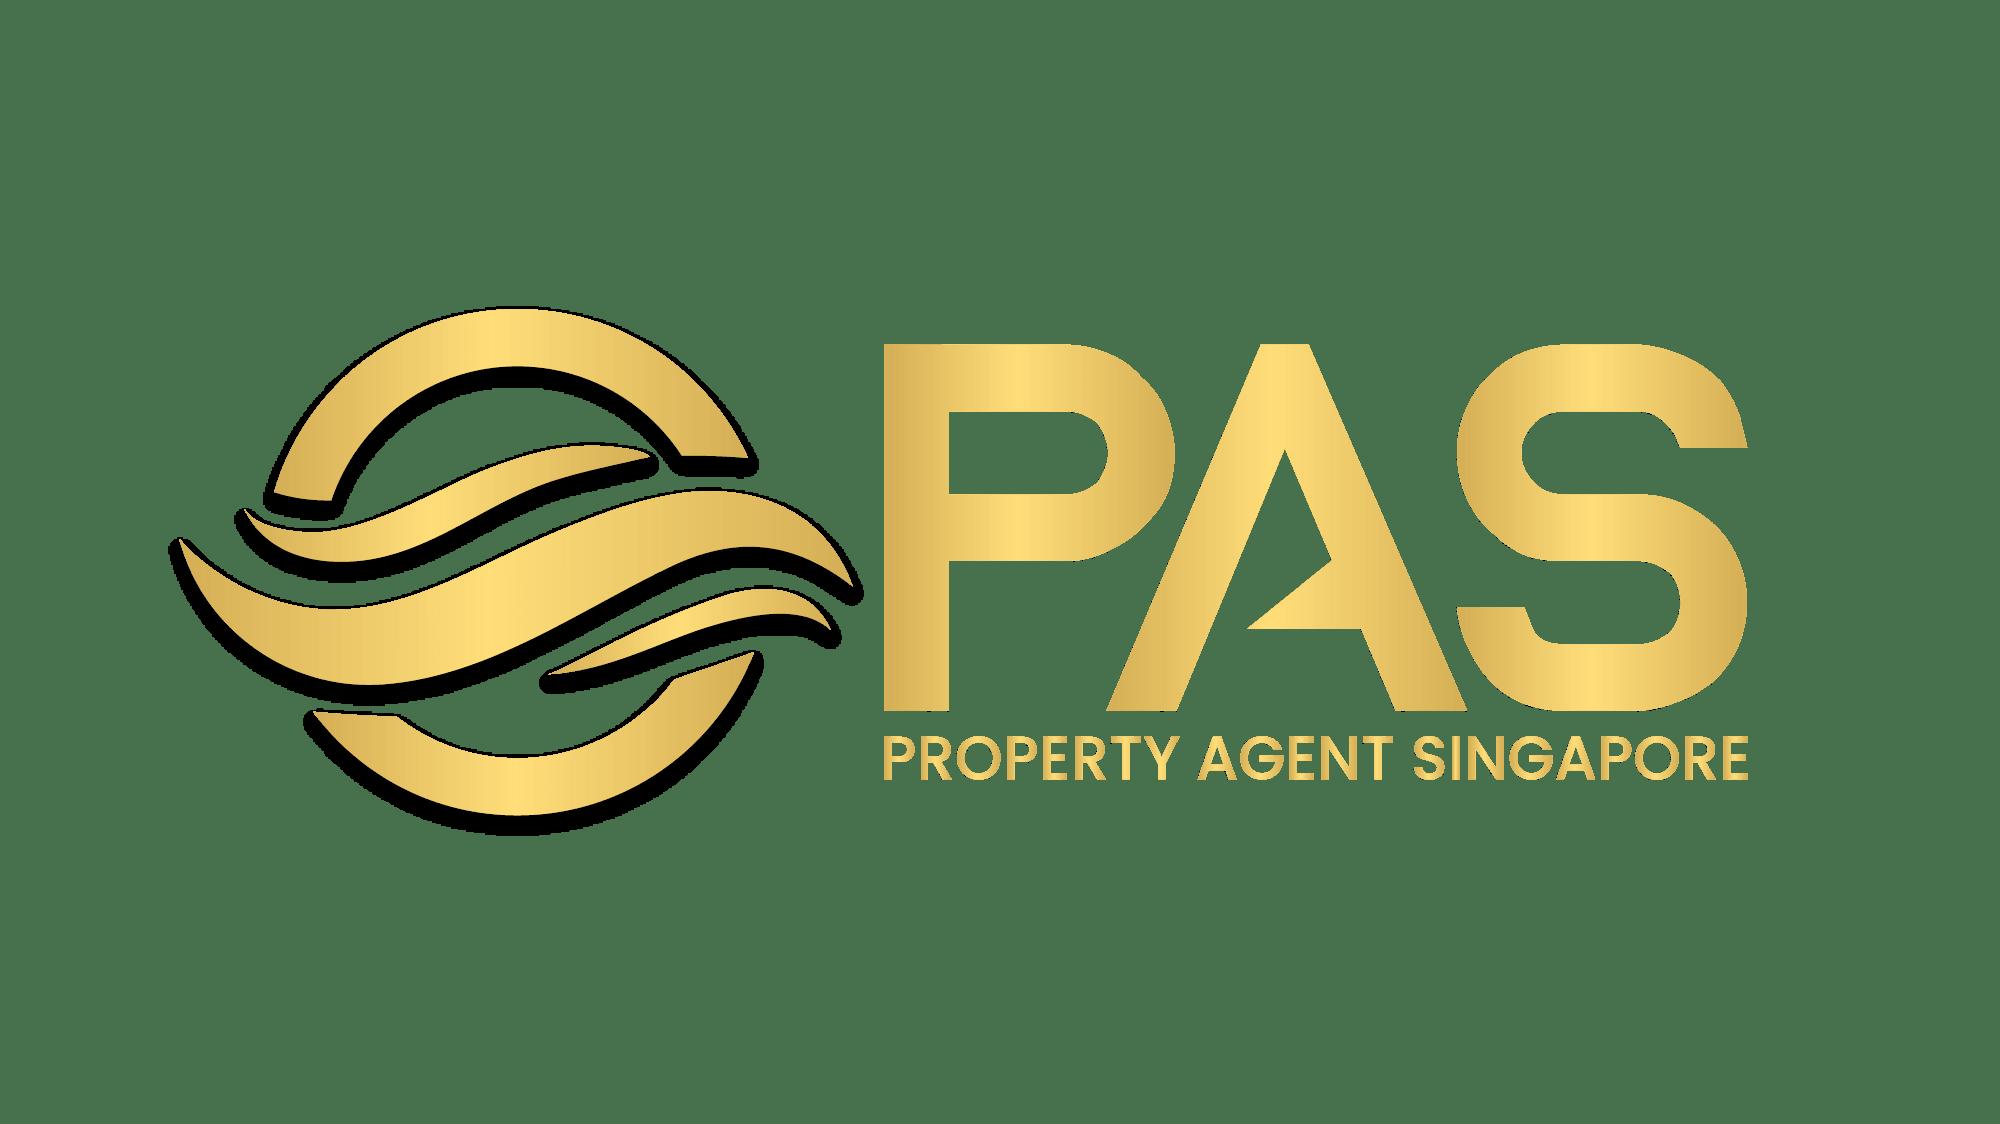 Property Agent Singapore